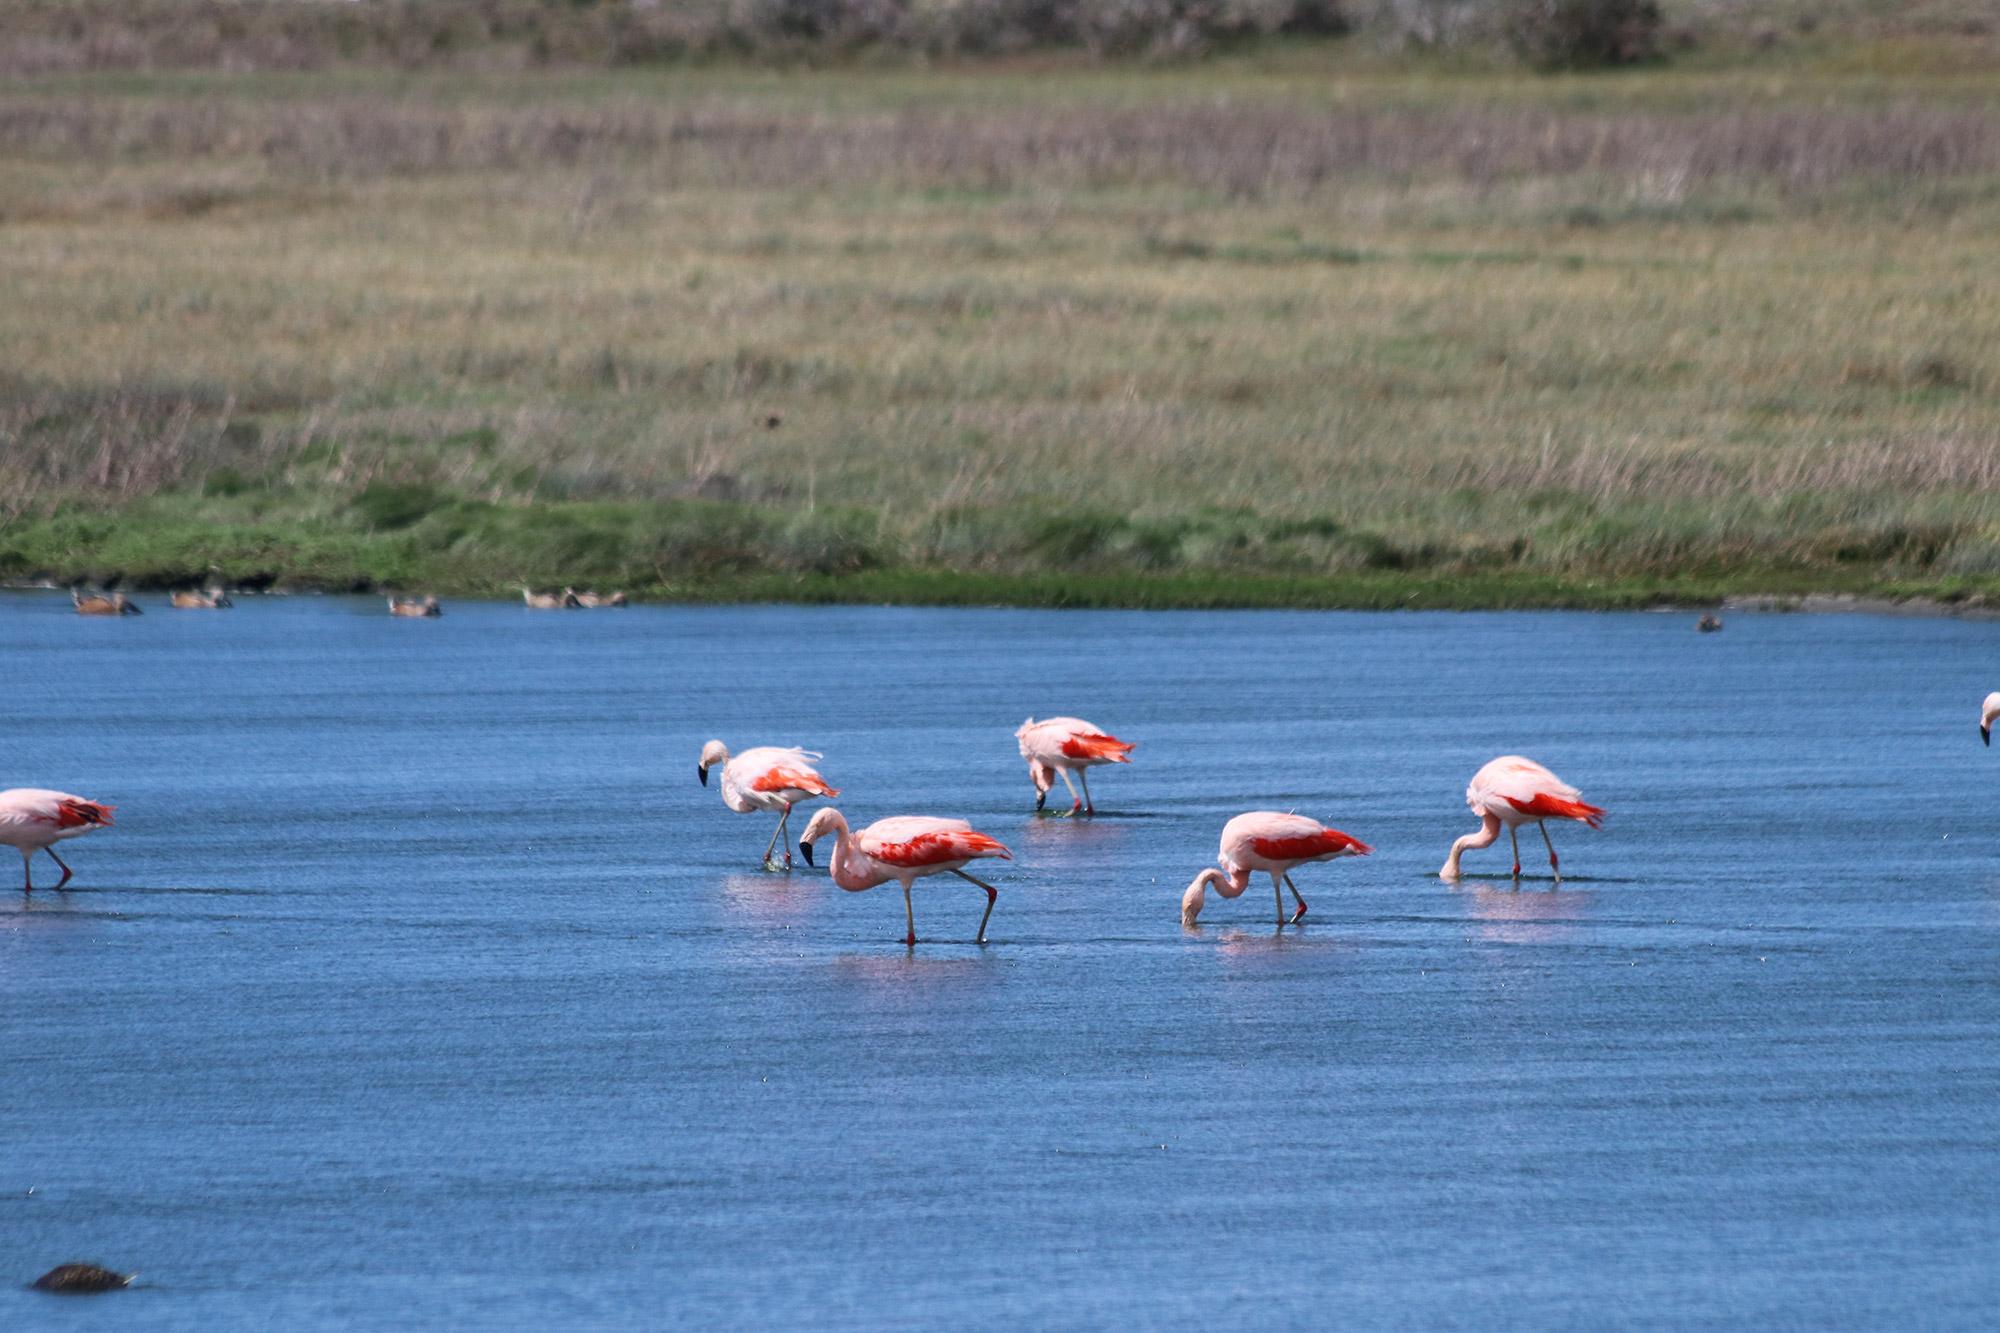 Reisverslag Patagonië - Laguna Nimez in El Calafate